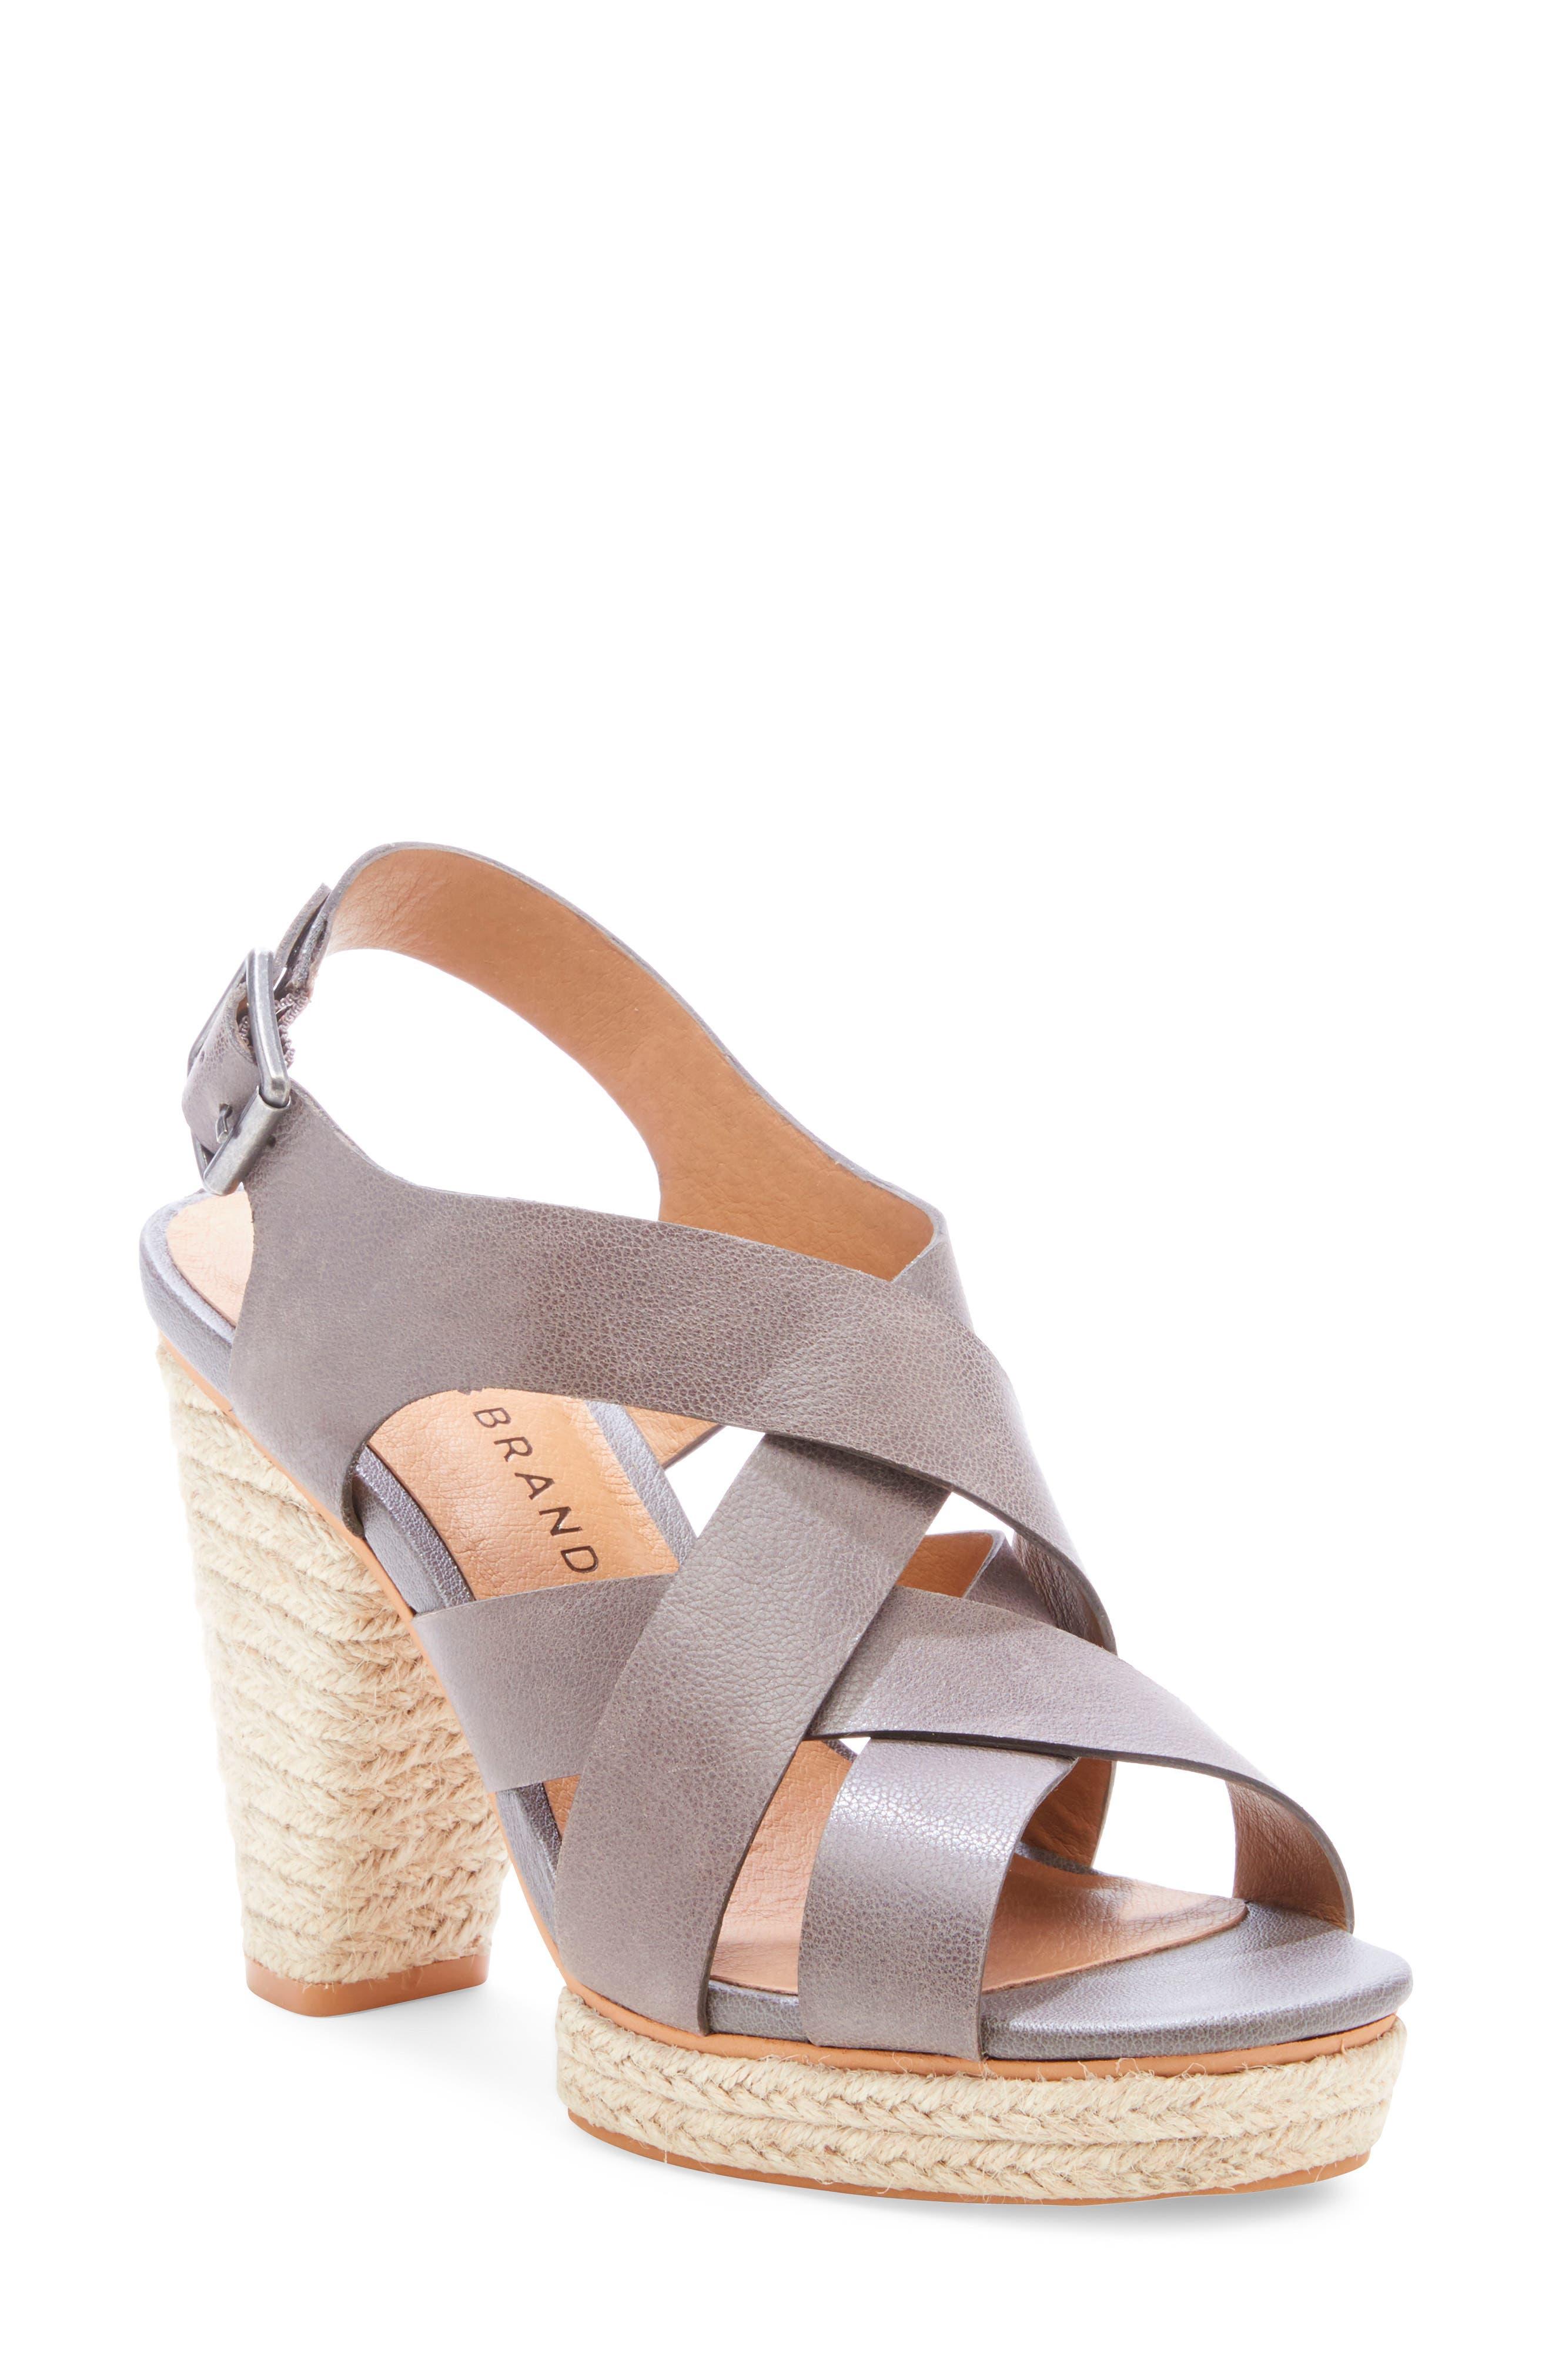 Lucky Brand Cabino Sandal- Grey